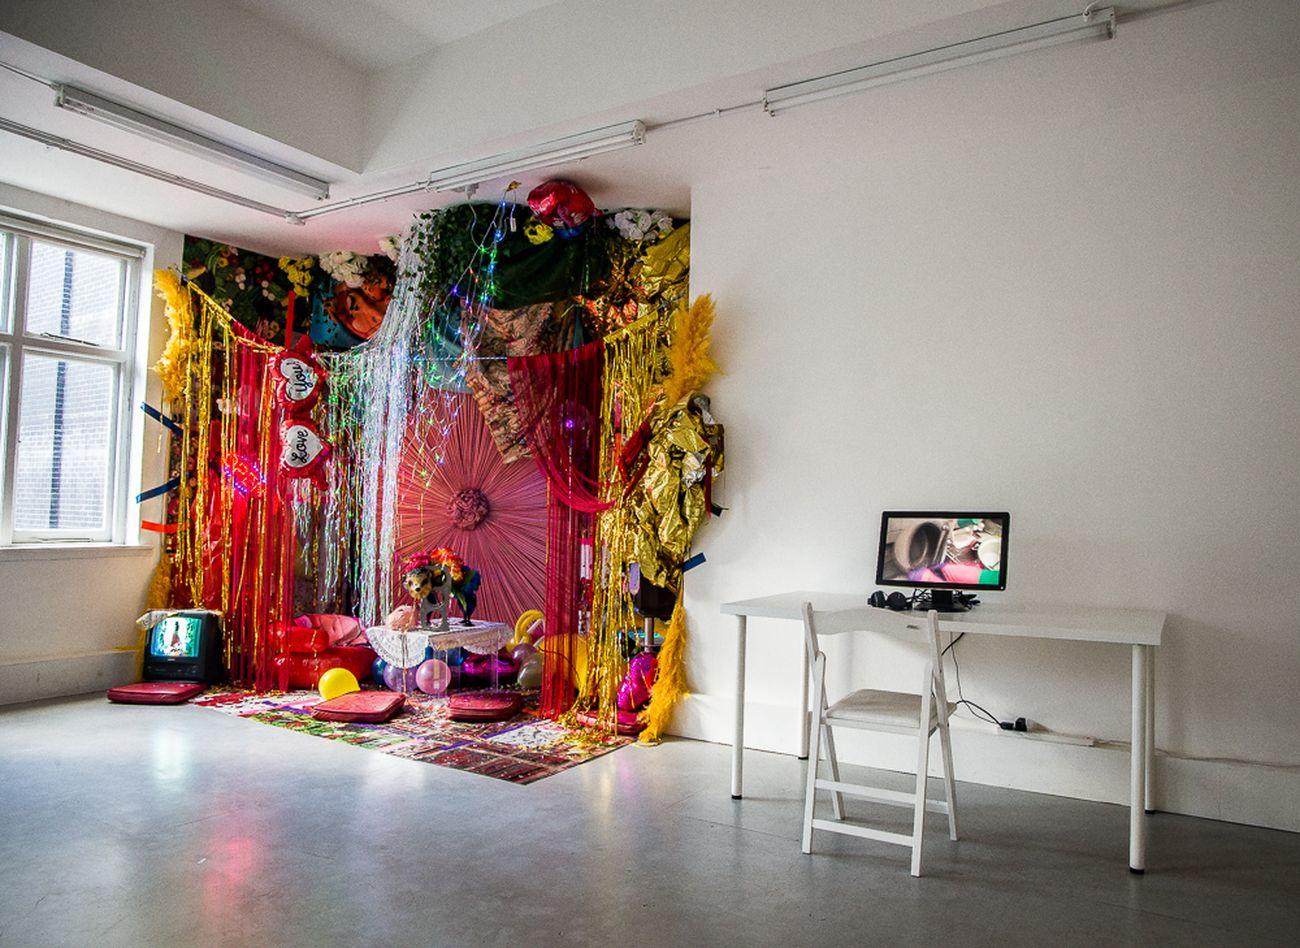 Alter Heroes Coalition. Exhibition view at Mimosa House, Londra 2018. Photo Katarzyna Perlak